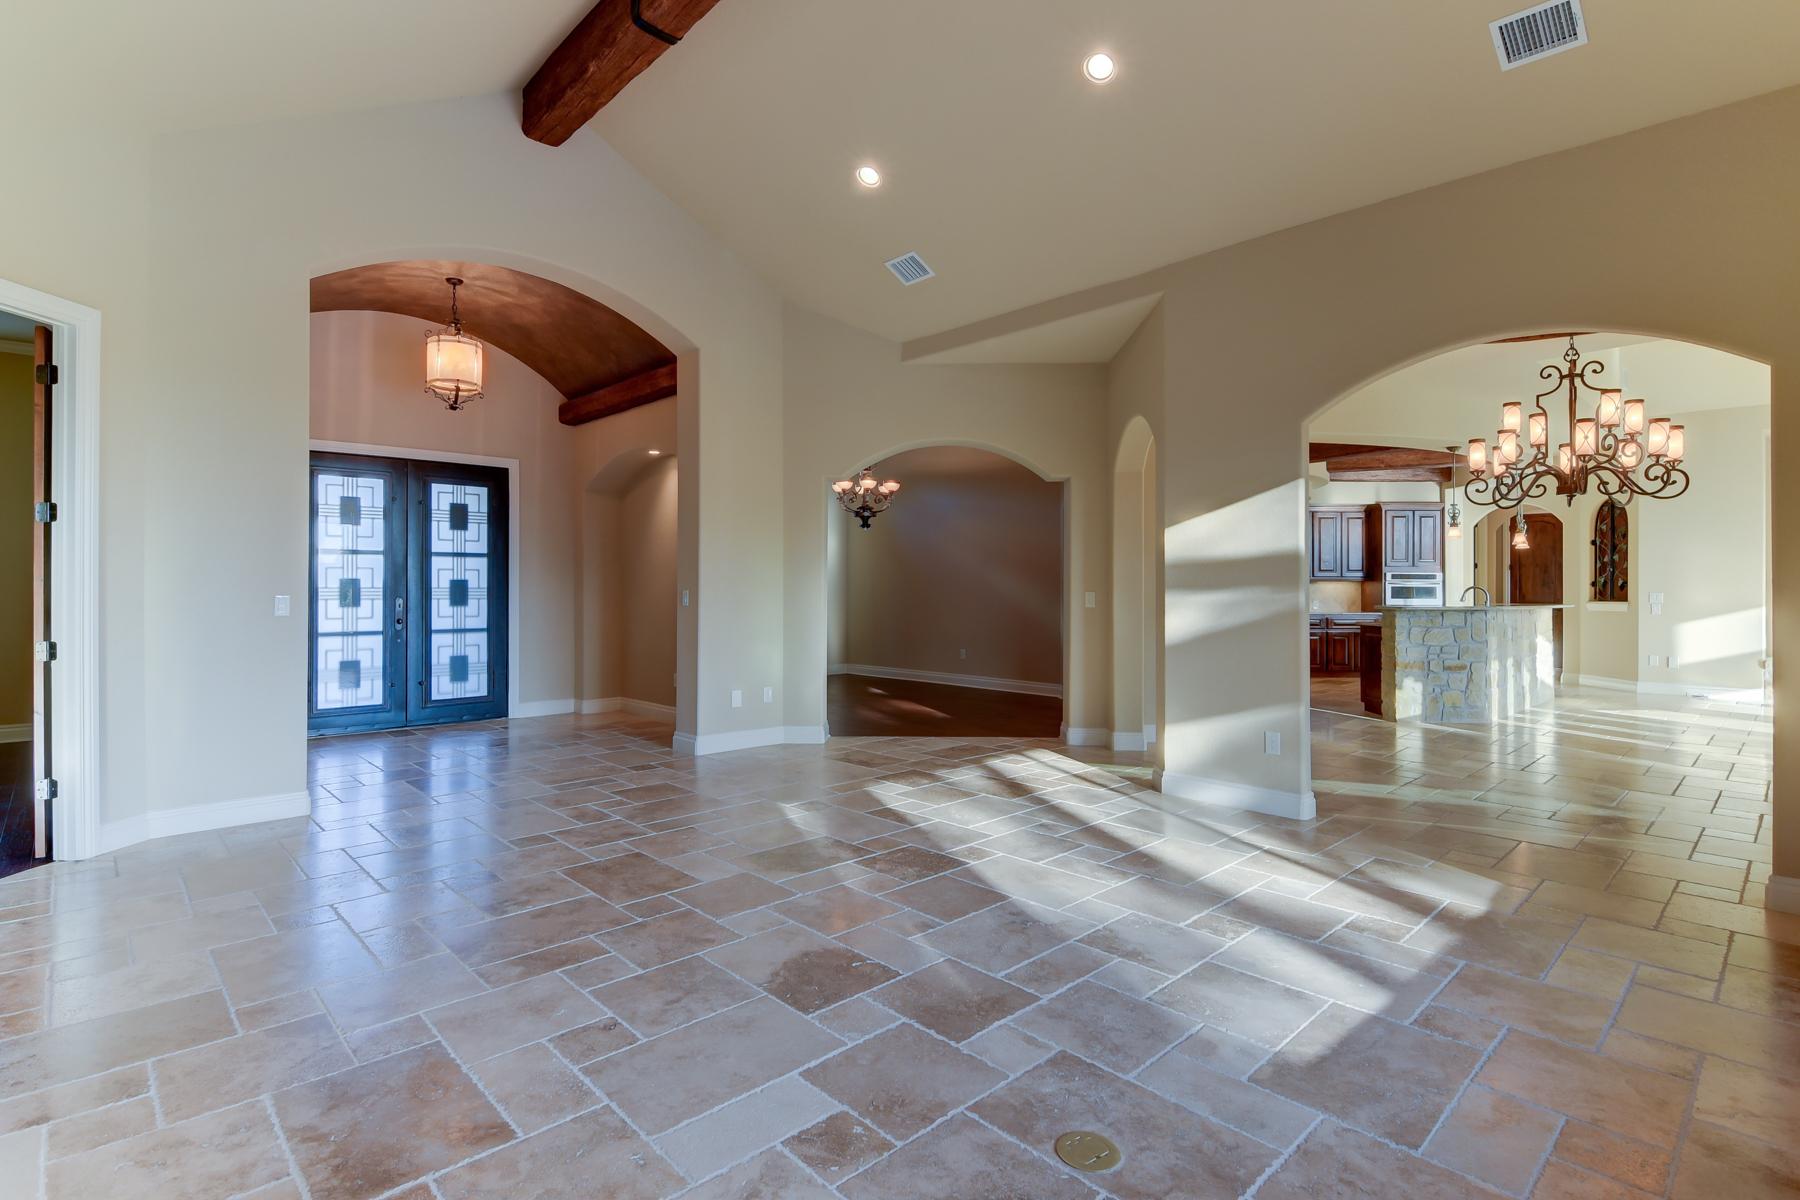 Additional photo for property listing at Gorgeous Estate in The Dominion 6 Paseo Rioja San Antonio, Texas 78257 United States